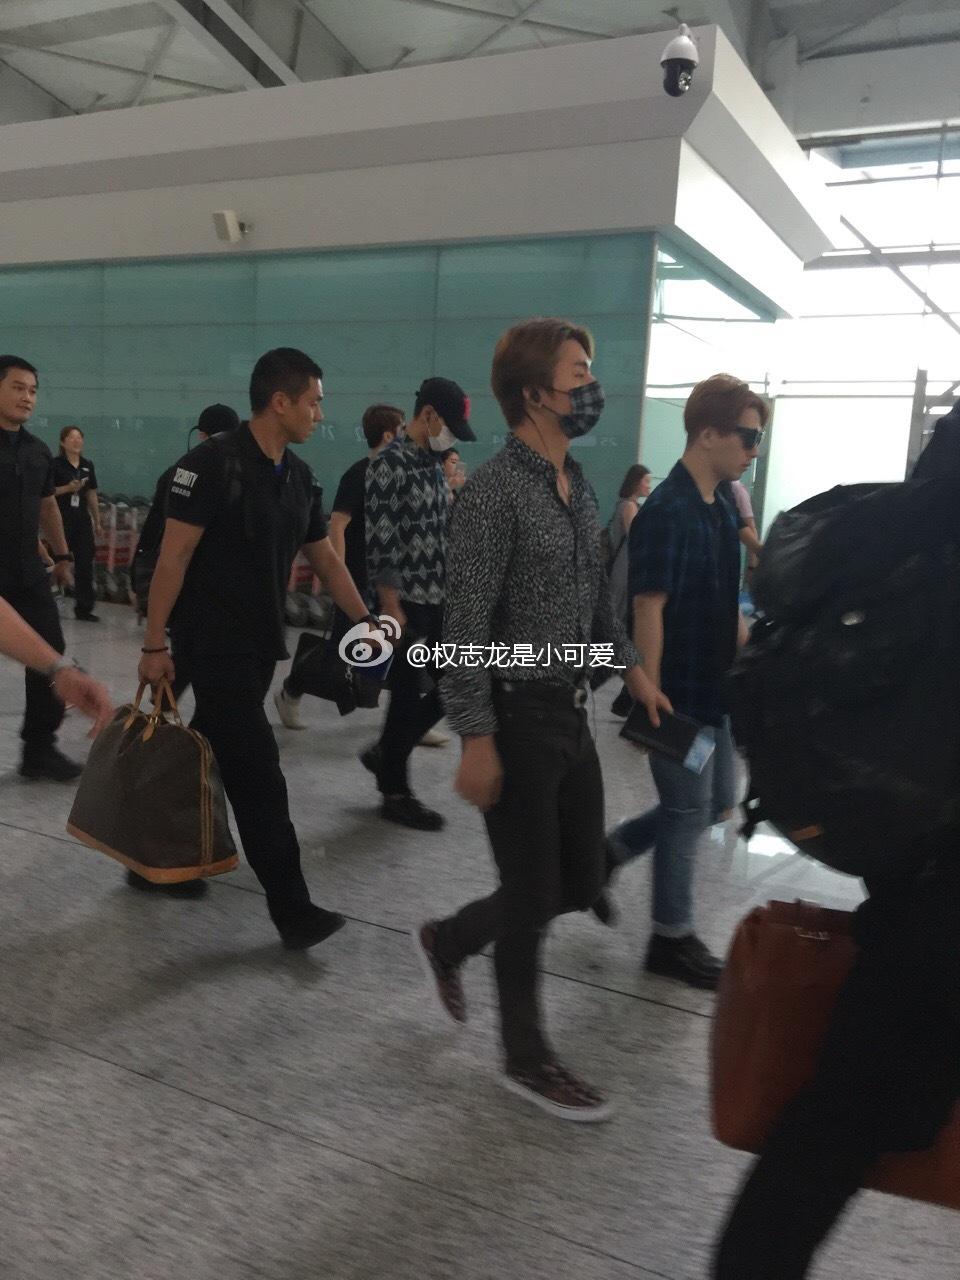 BIGBANG Departure Dalian 2016-06-26 (1)